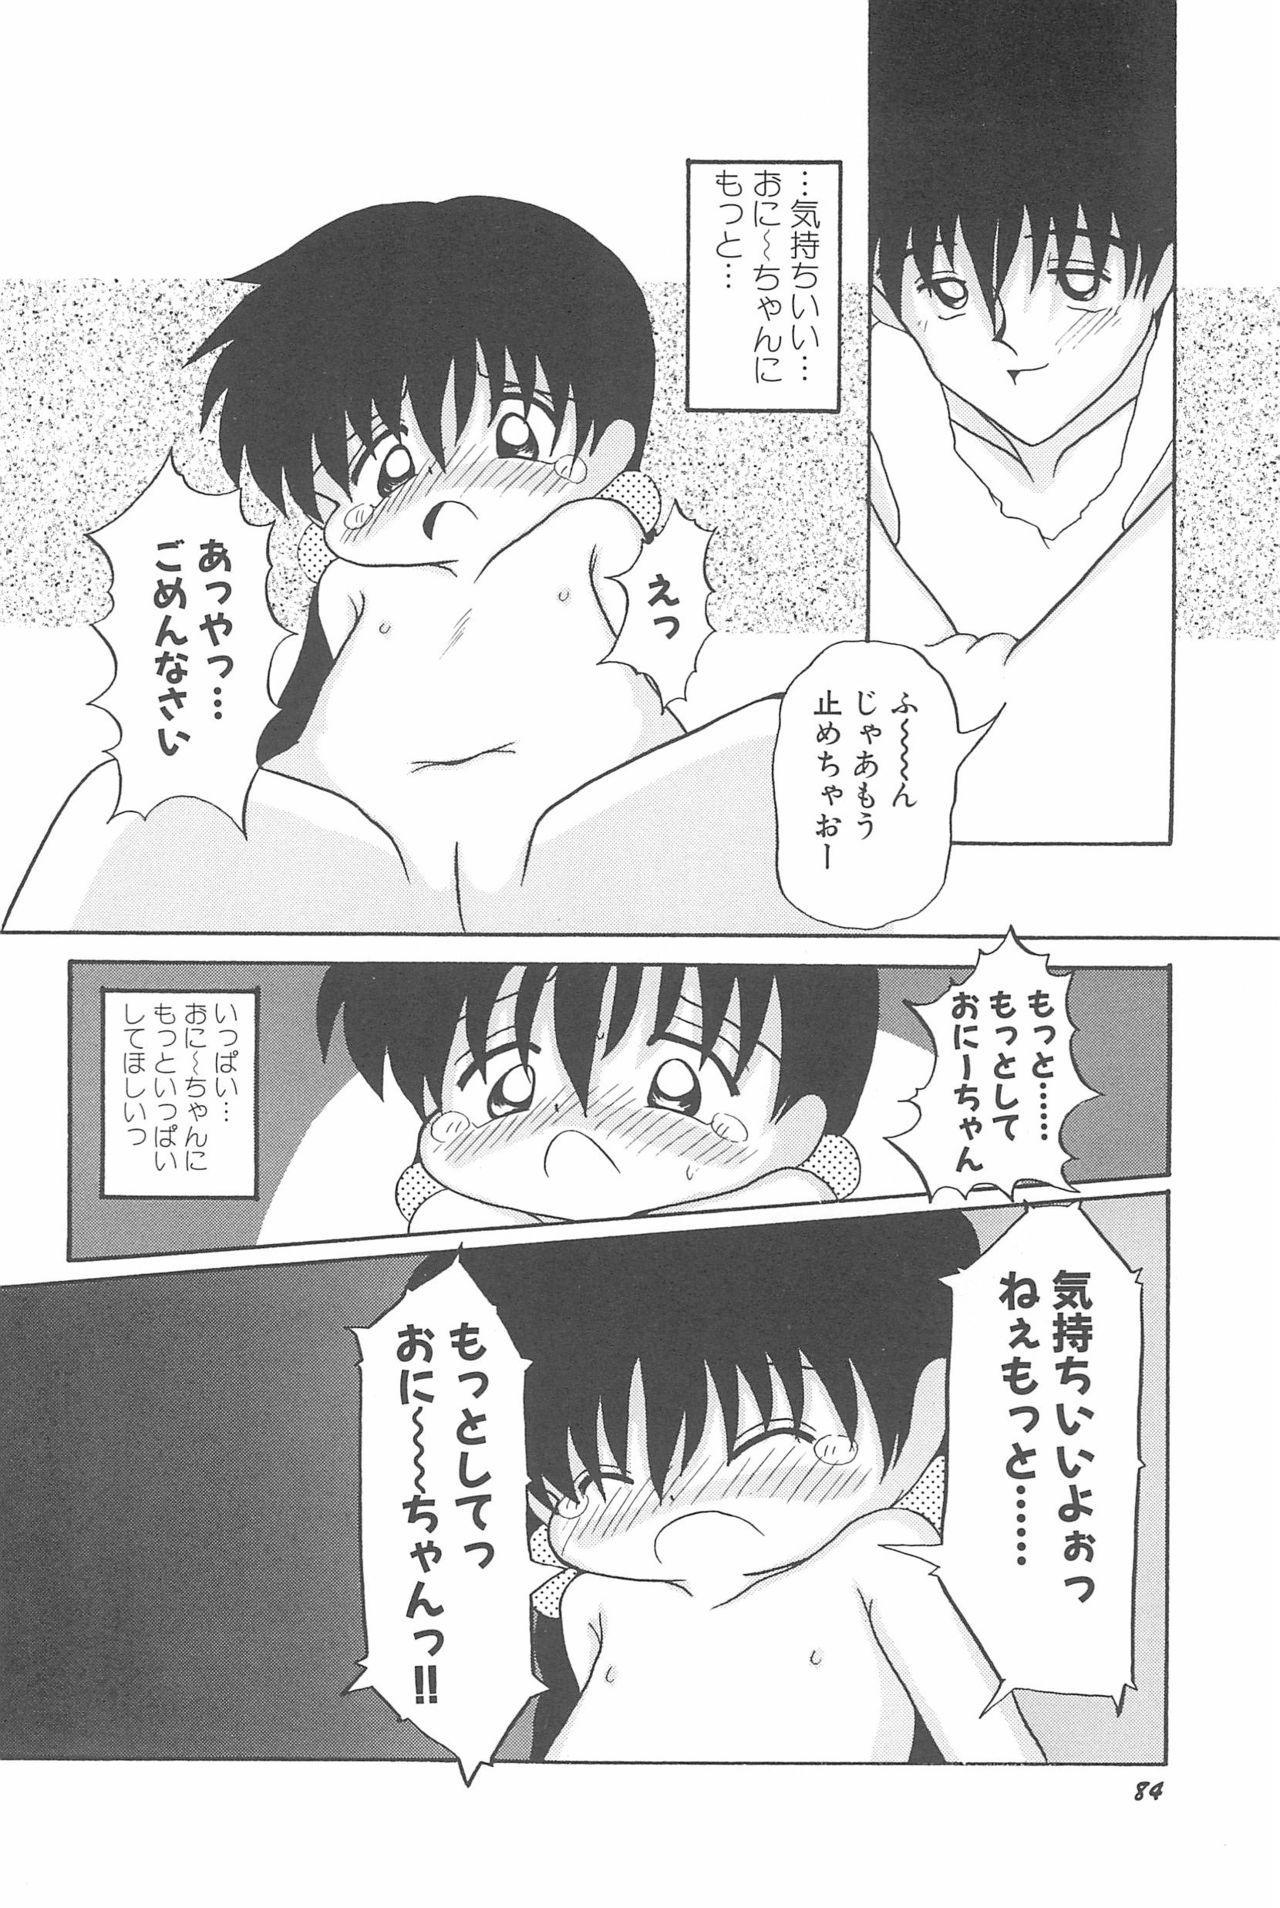 Aoi Shojokyuu 89